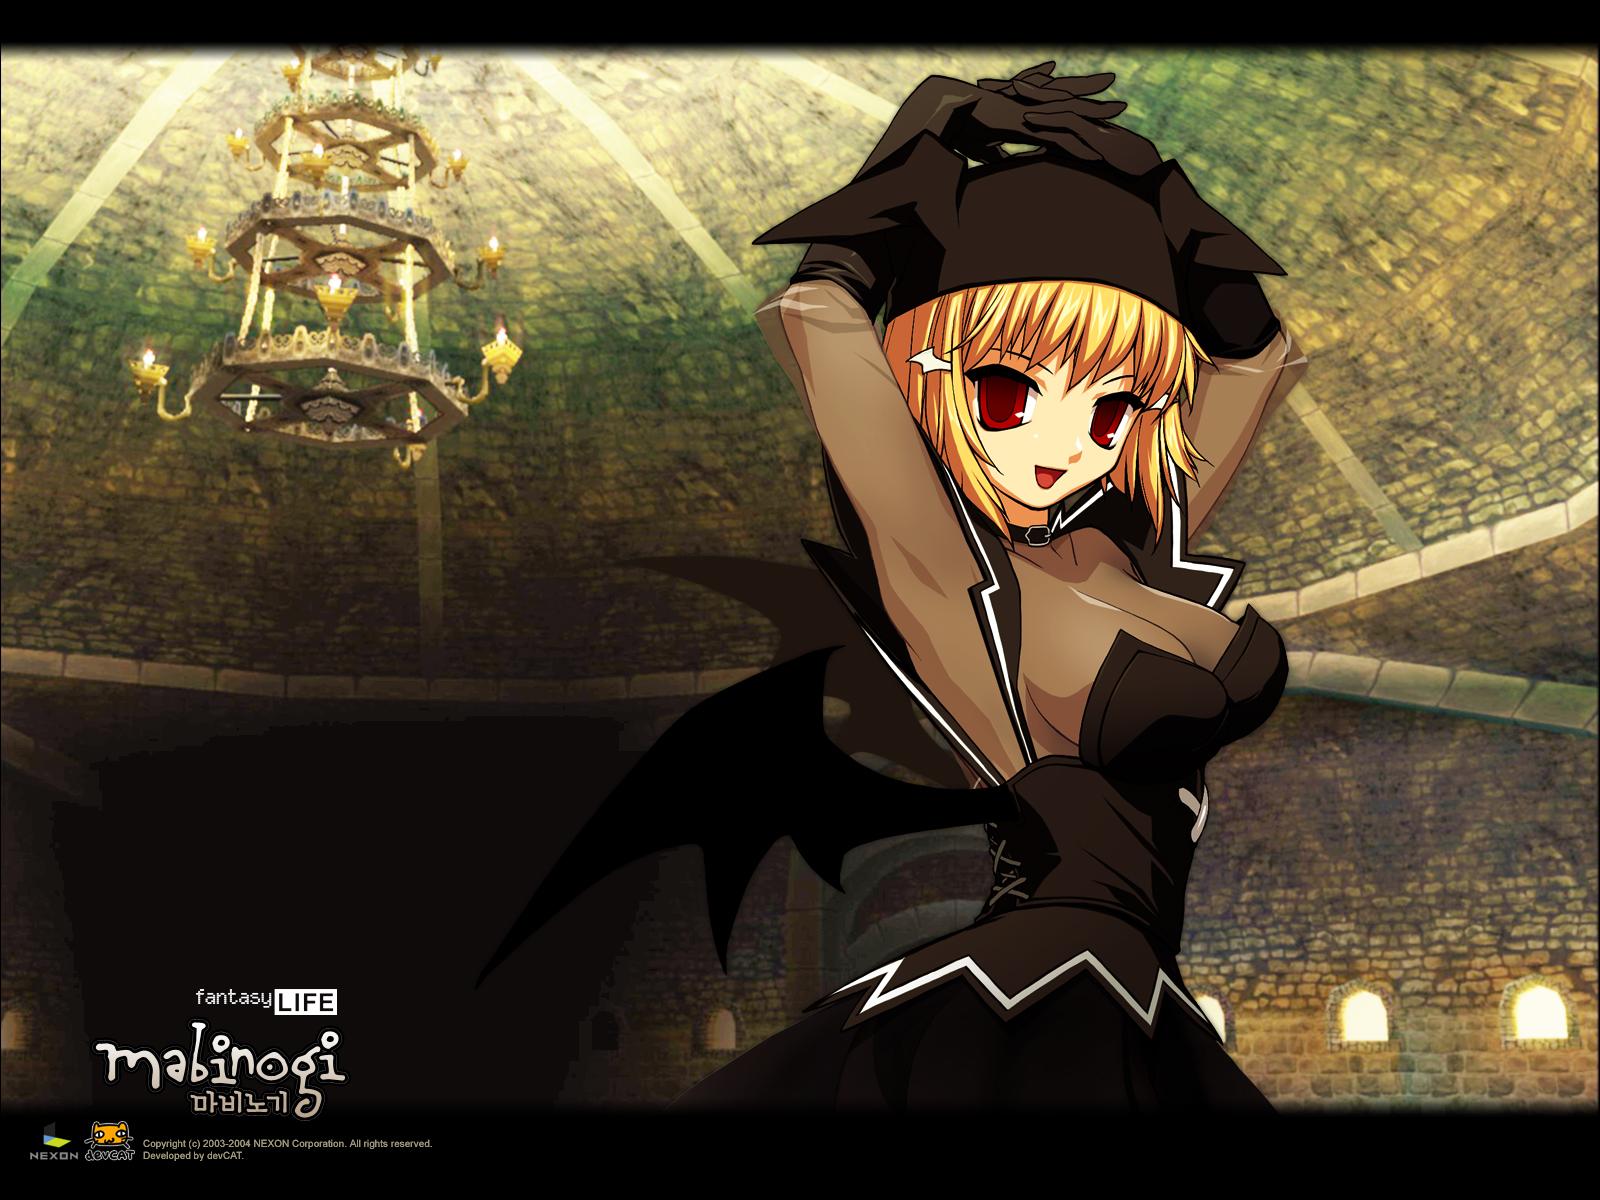 blonde_hair breasts cleavage demon dress elbow_gloves gloves mabinogi red_eyes succubus wings